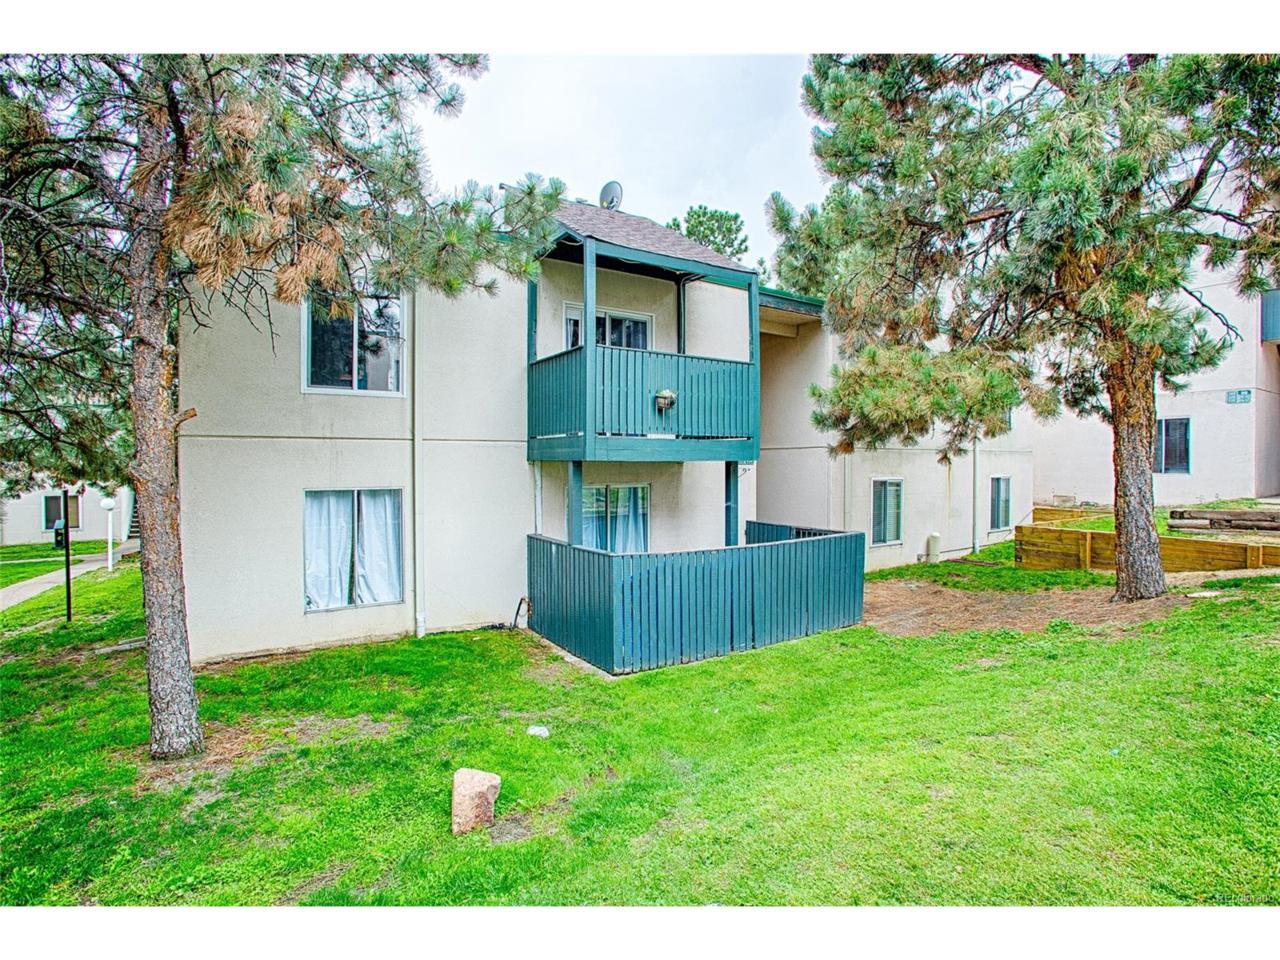 9725 E Harvard Avenue #446, Denver, CO 80231 (MLS #5311026) :: 8z Real Estate